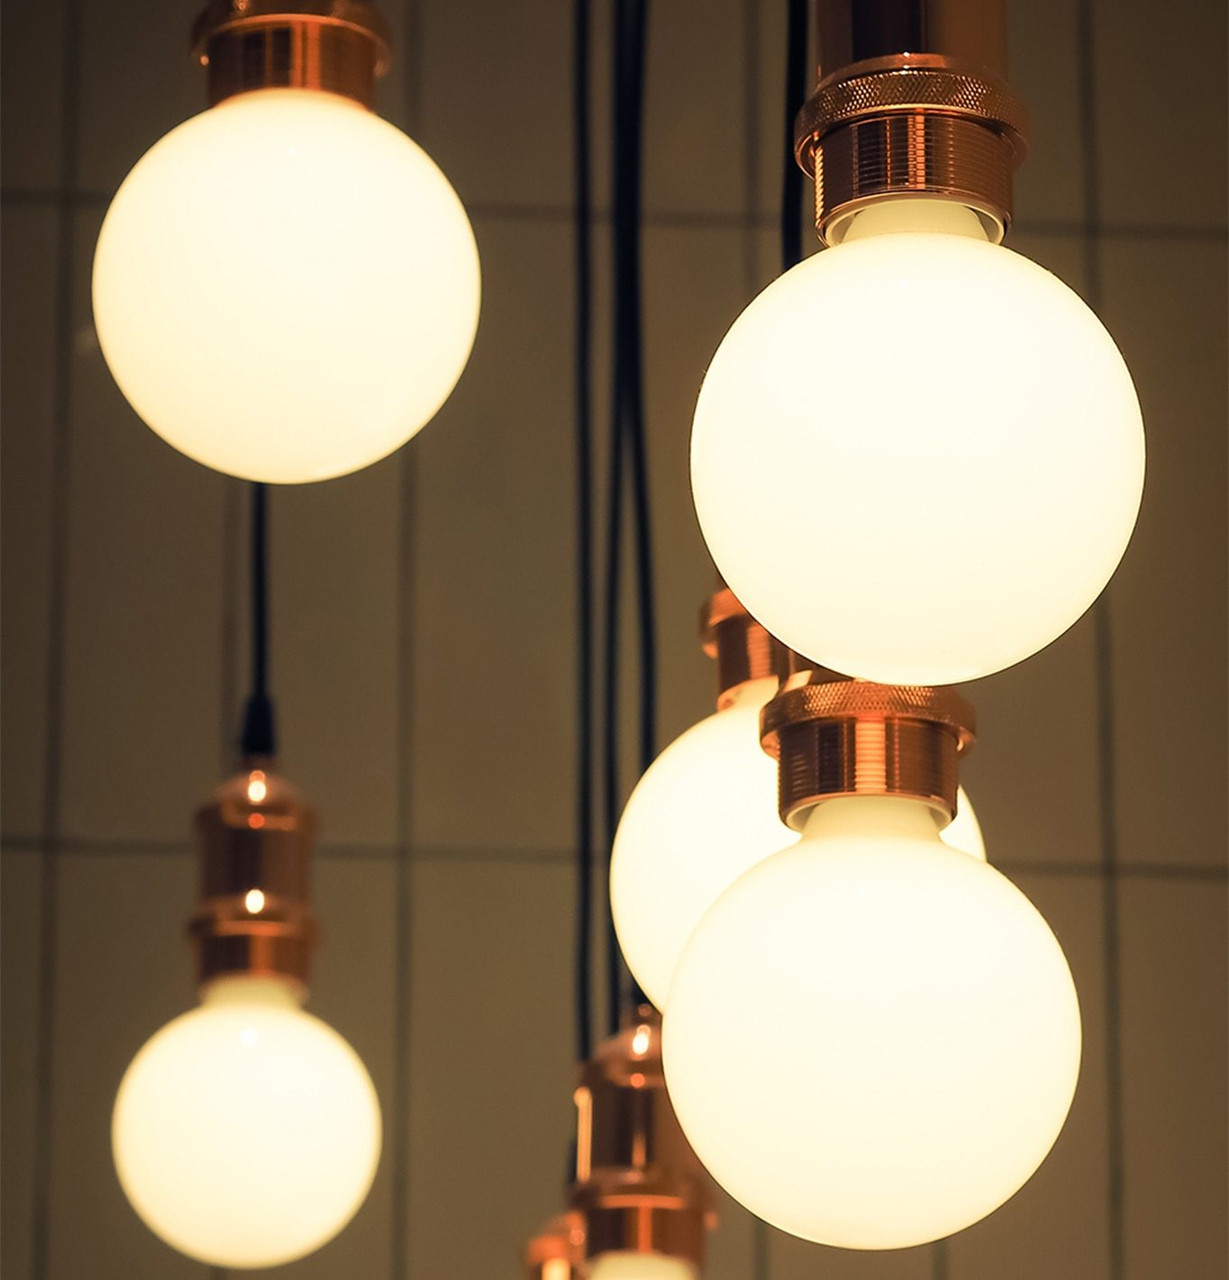 LED G125 Extra Warm White Light Bulbs